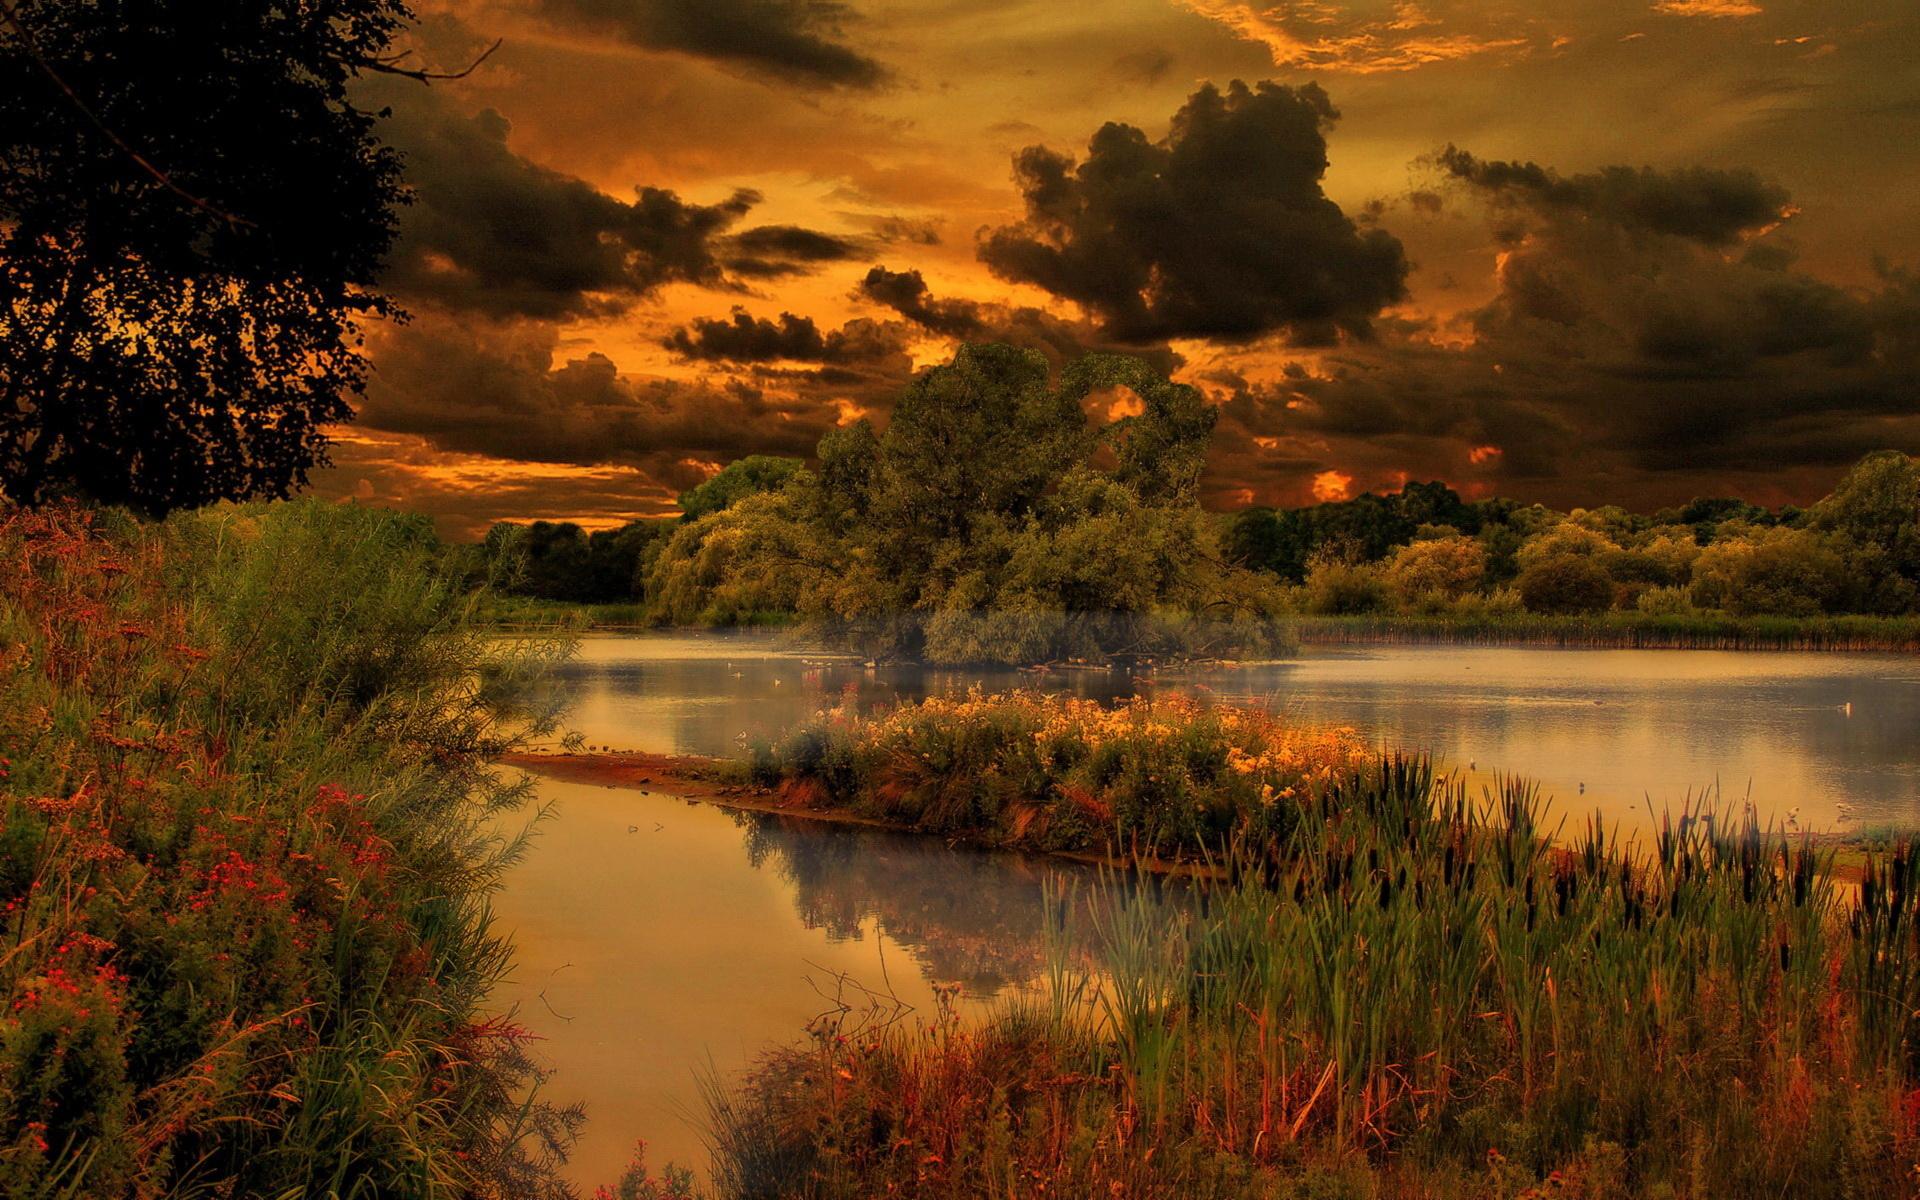 озеро в лесу на закате  № 380216  скачать